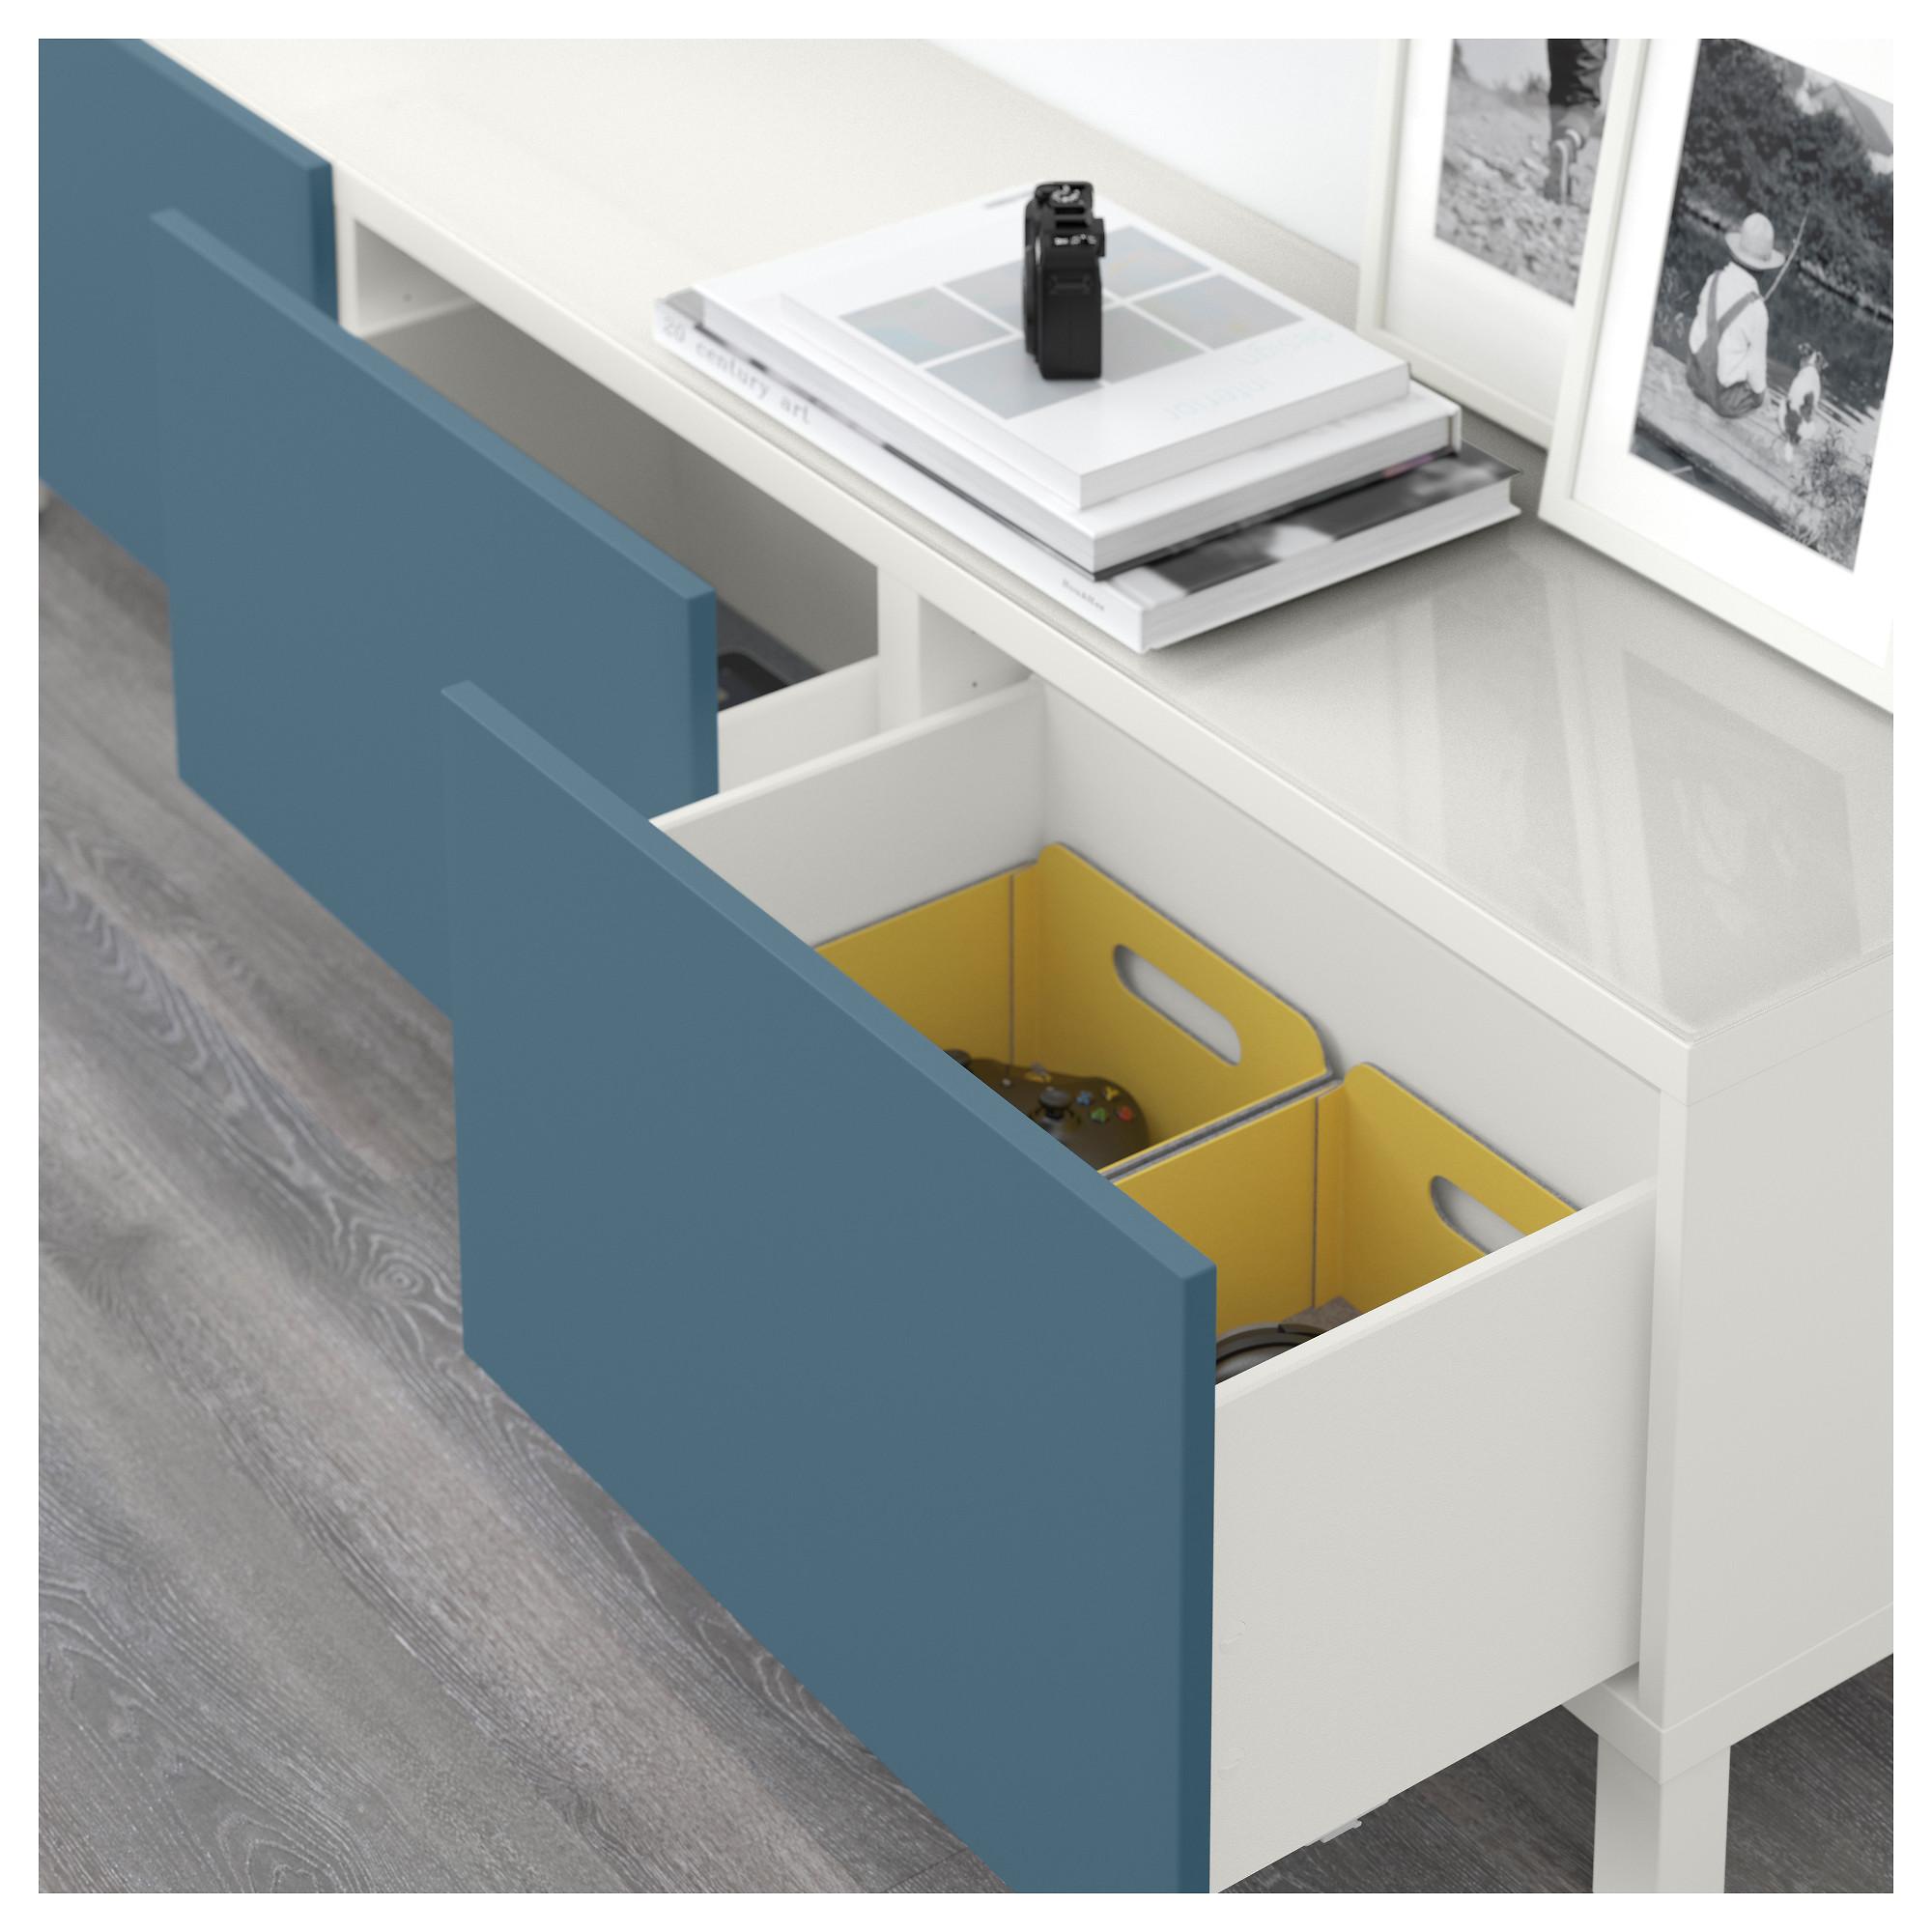 Комбинация для хранения с ящиками БЕСТО темно-синий артикуль № 992.450.70 в наличии. Интернет каталог IKEA Минск. Быстрая доставка и установка.